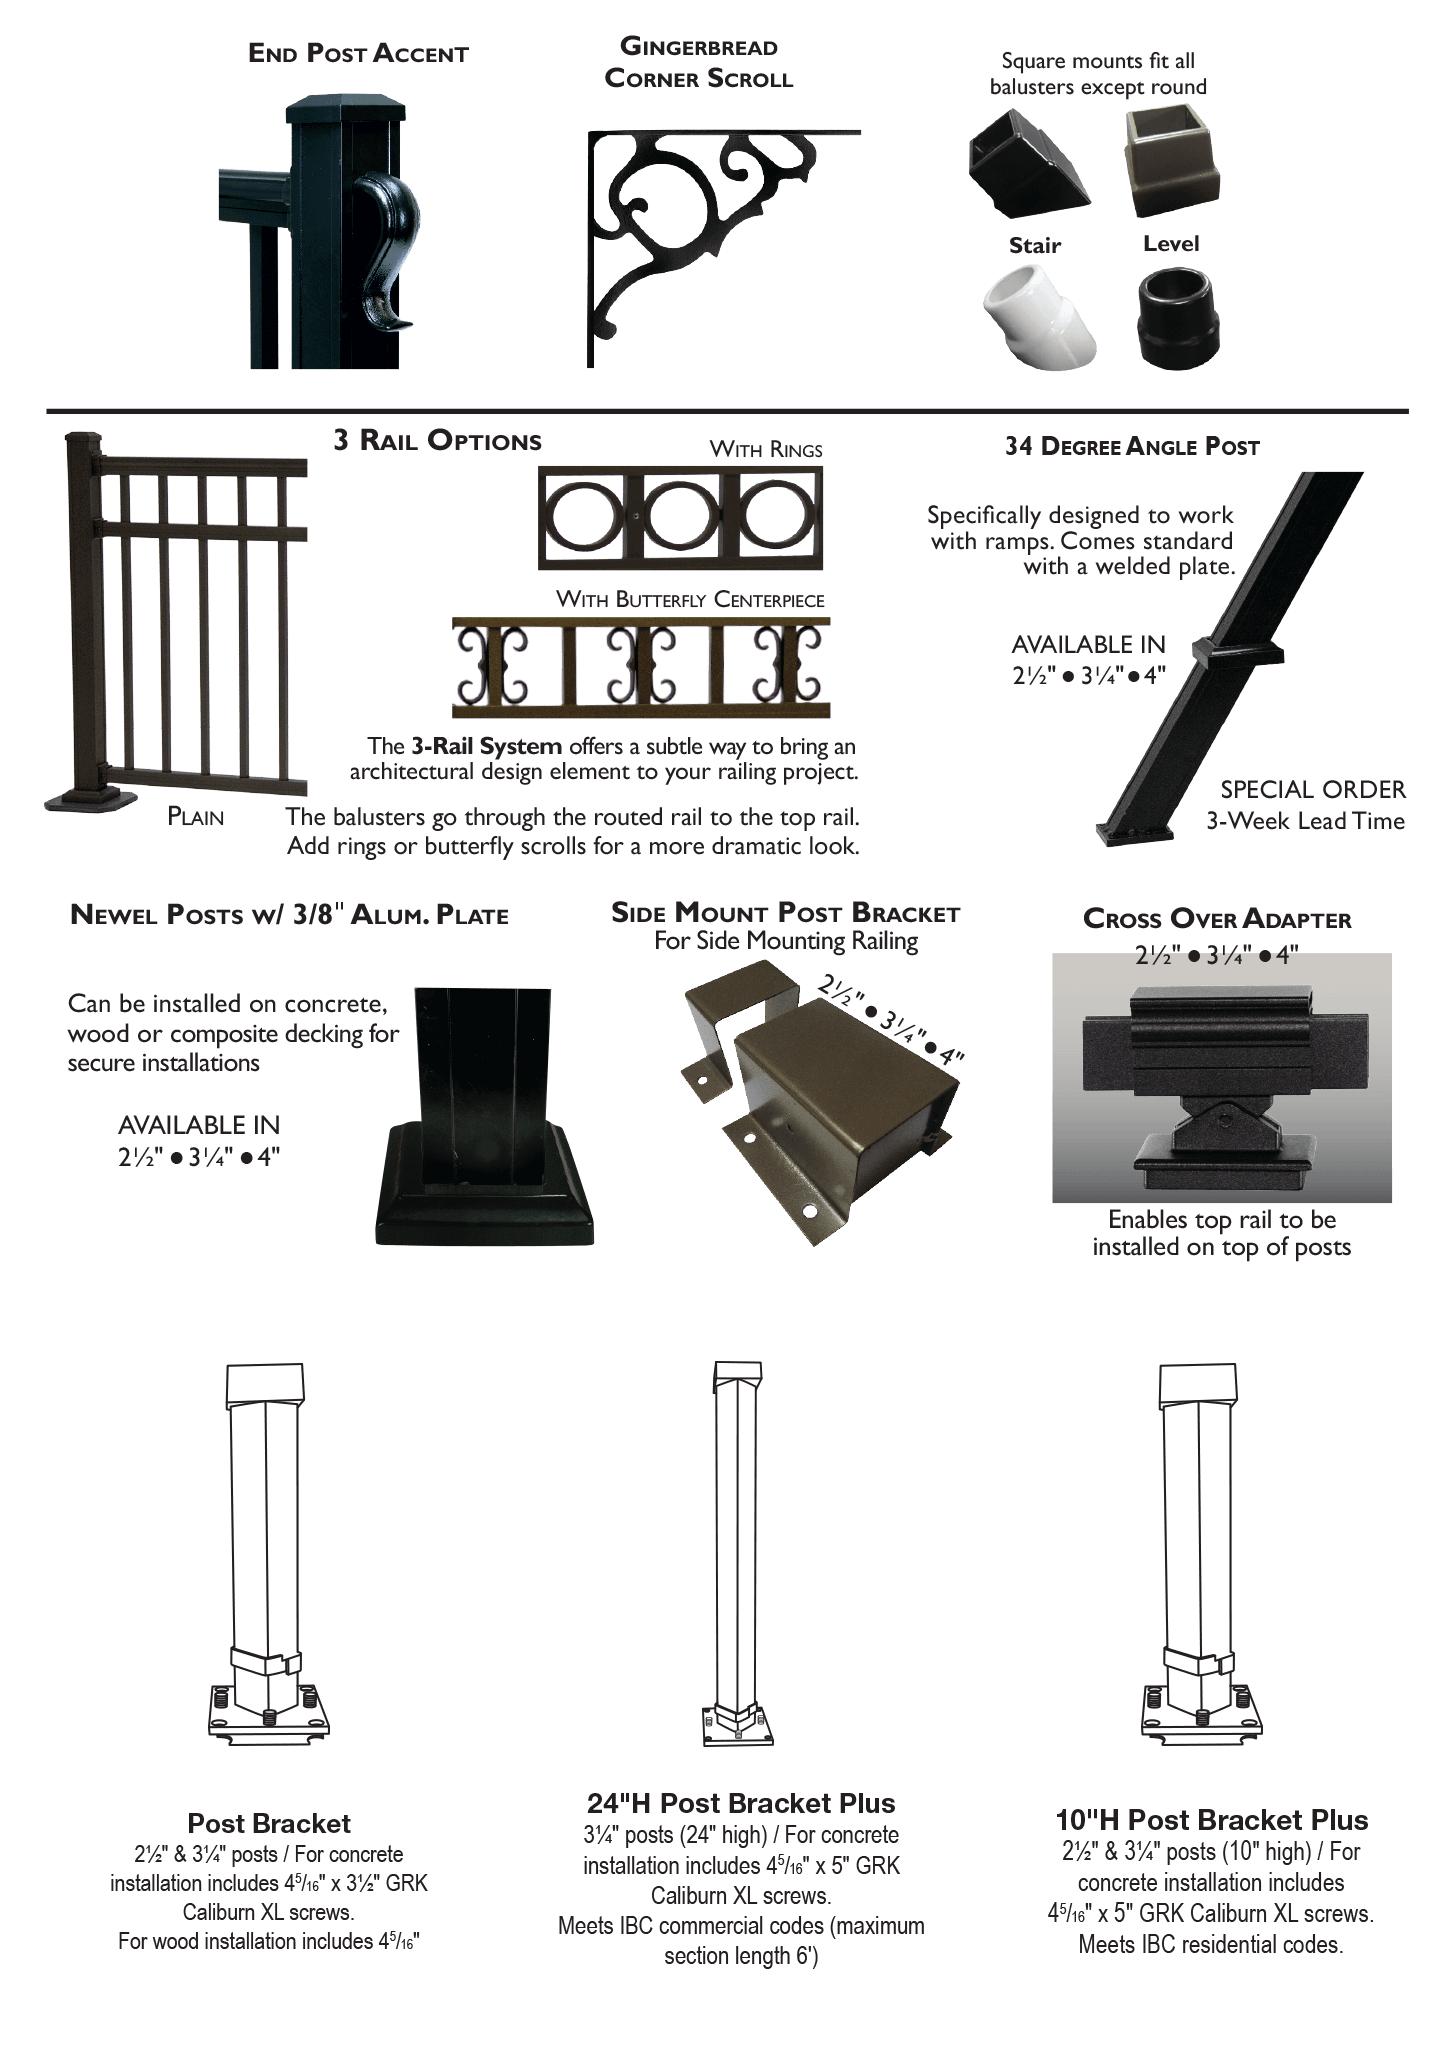 Key-Link Fencing & Railing - Aluminum Railing Accessories